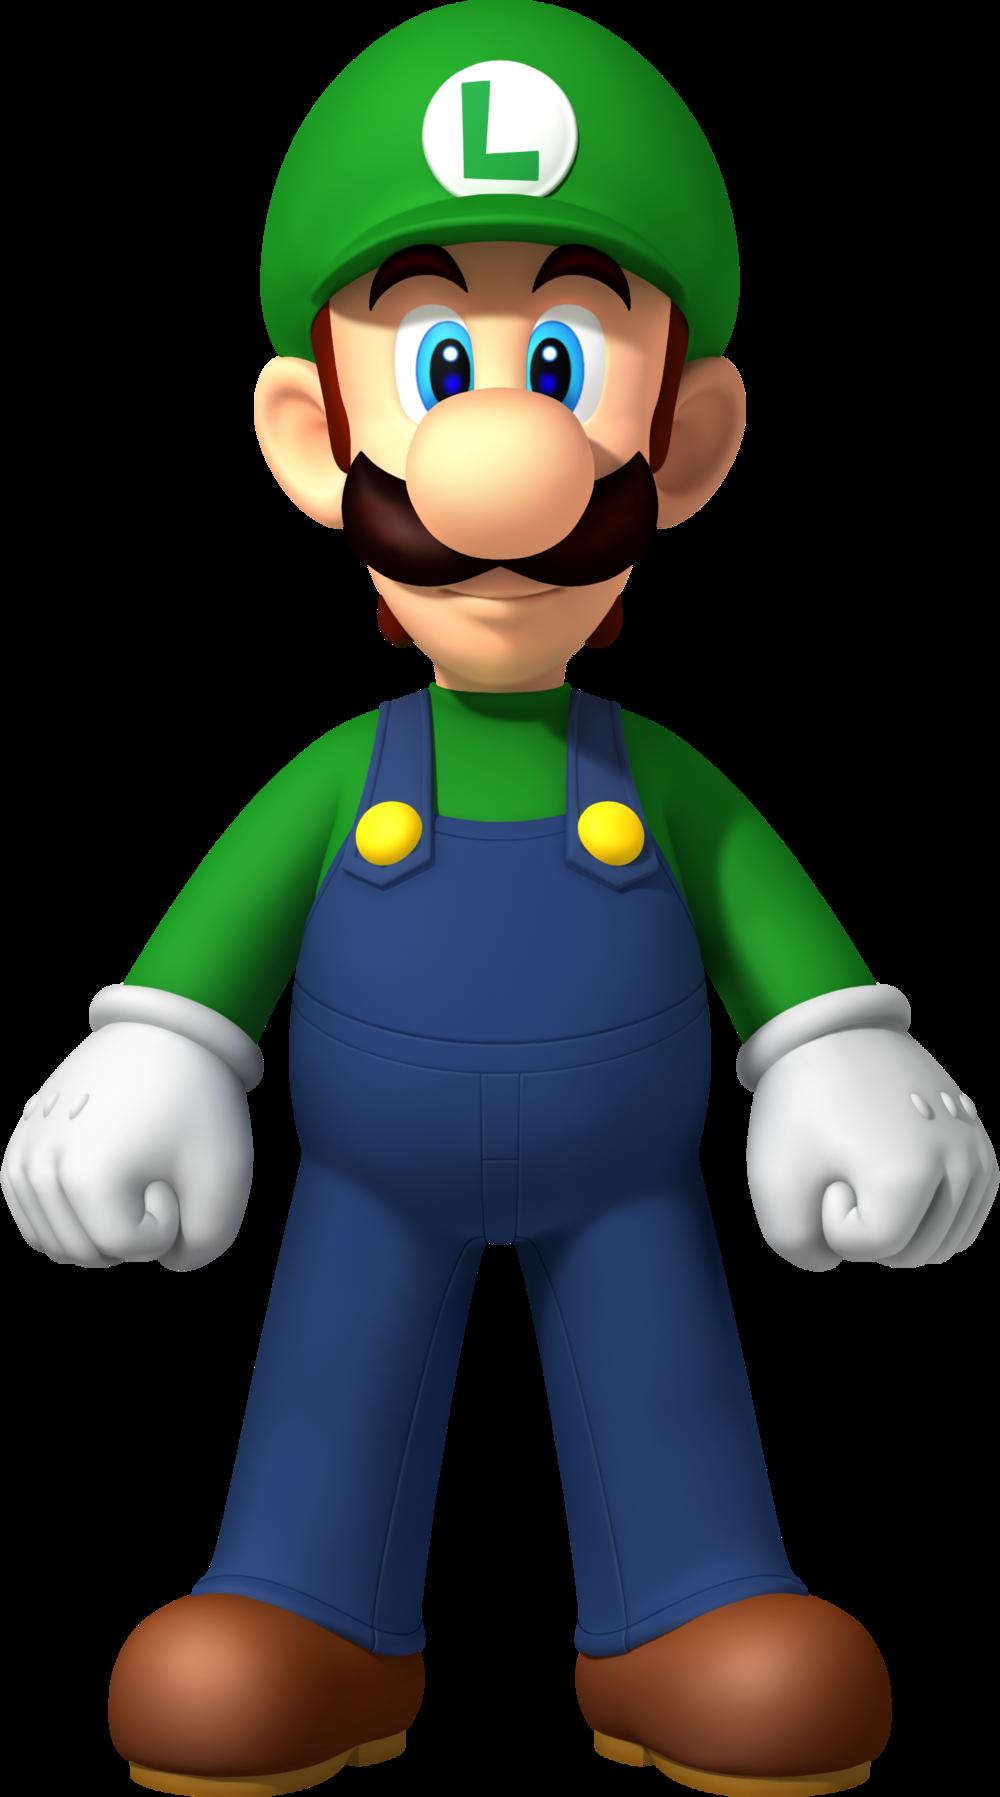 Moustache clipart luigi. Racist mario wiki fandom